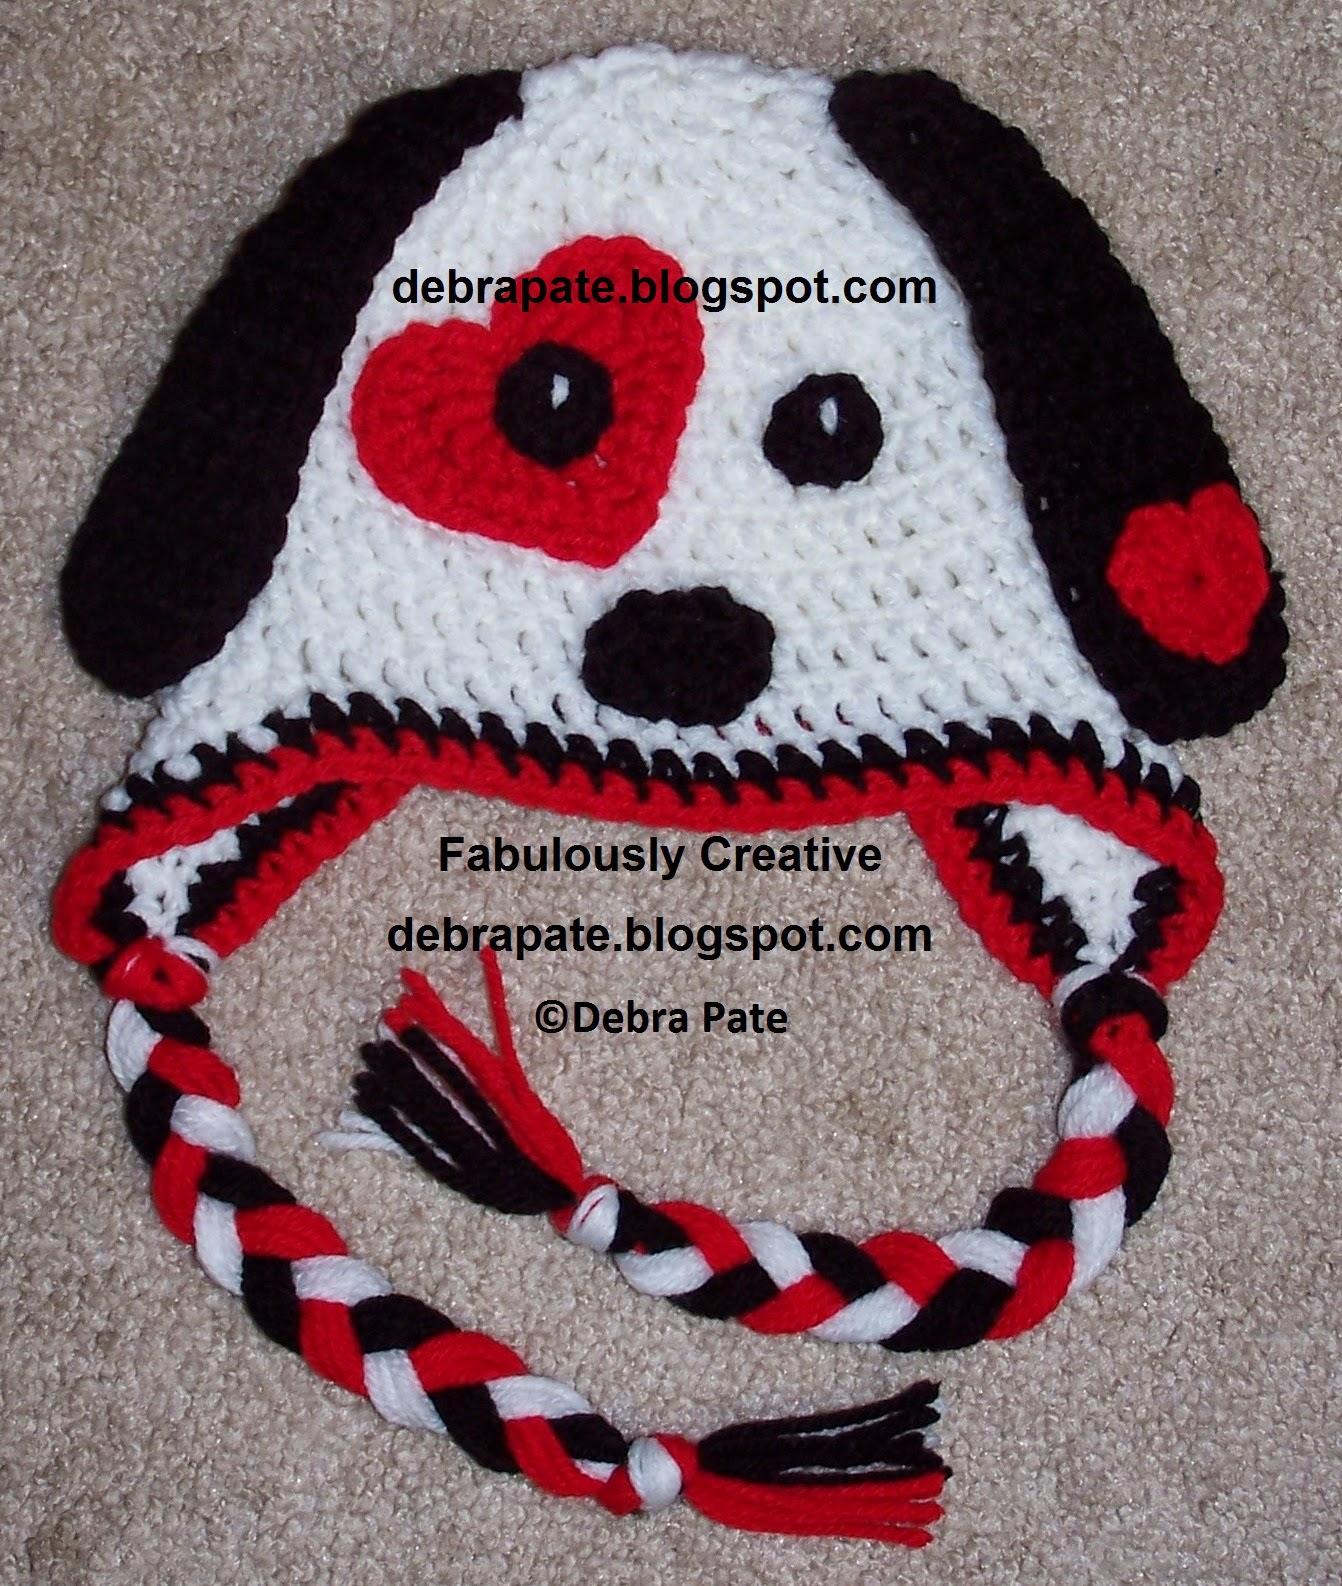 Fabulously Creative: PUPPY LOVE CROCHET HAT - VALENTINE'S DAY